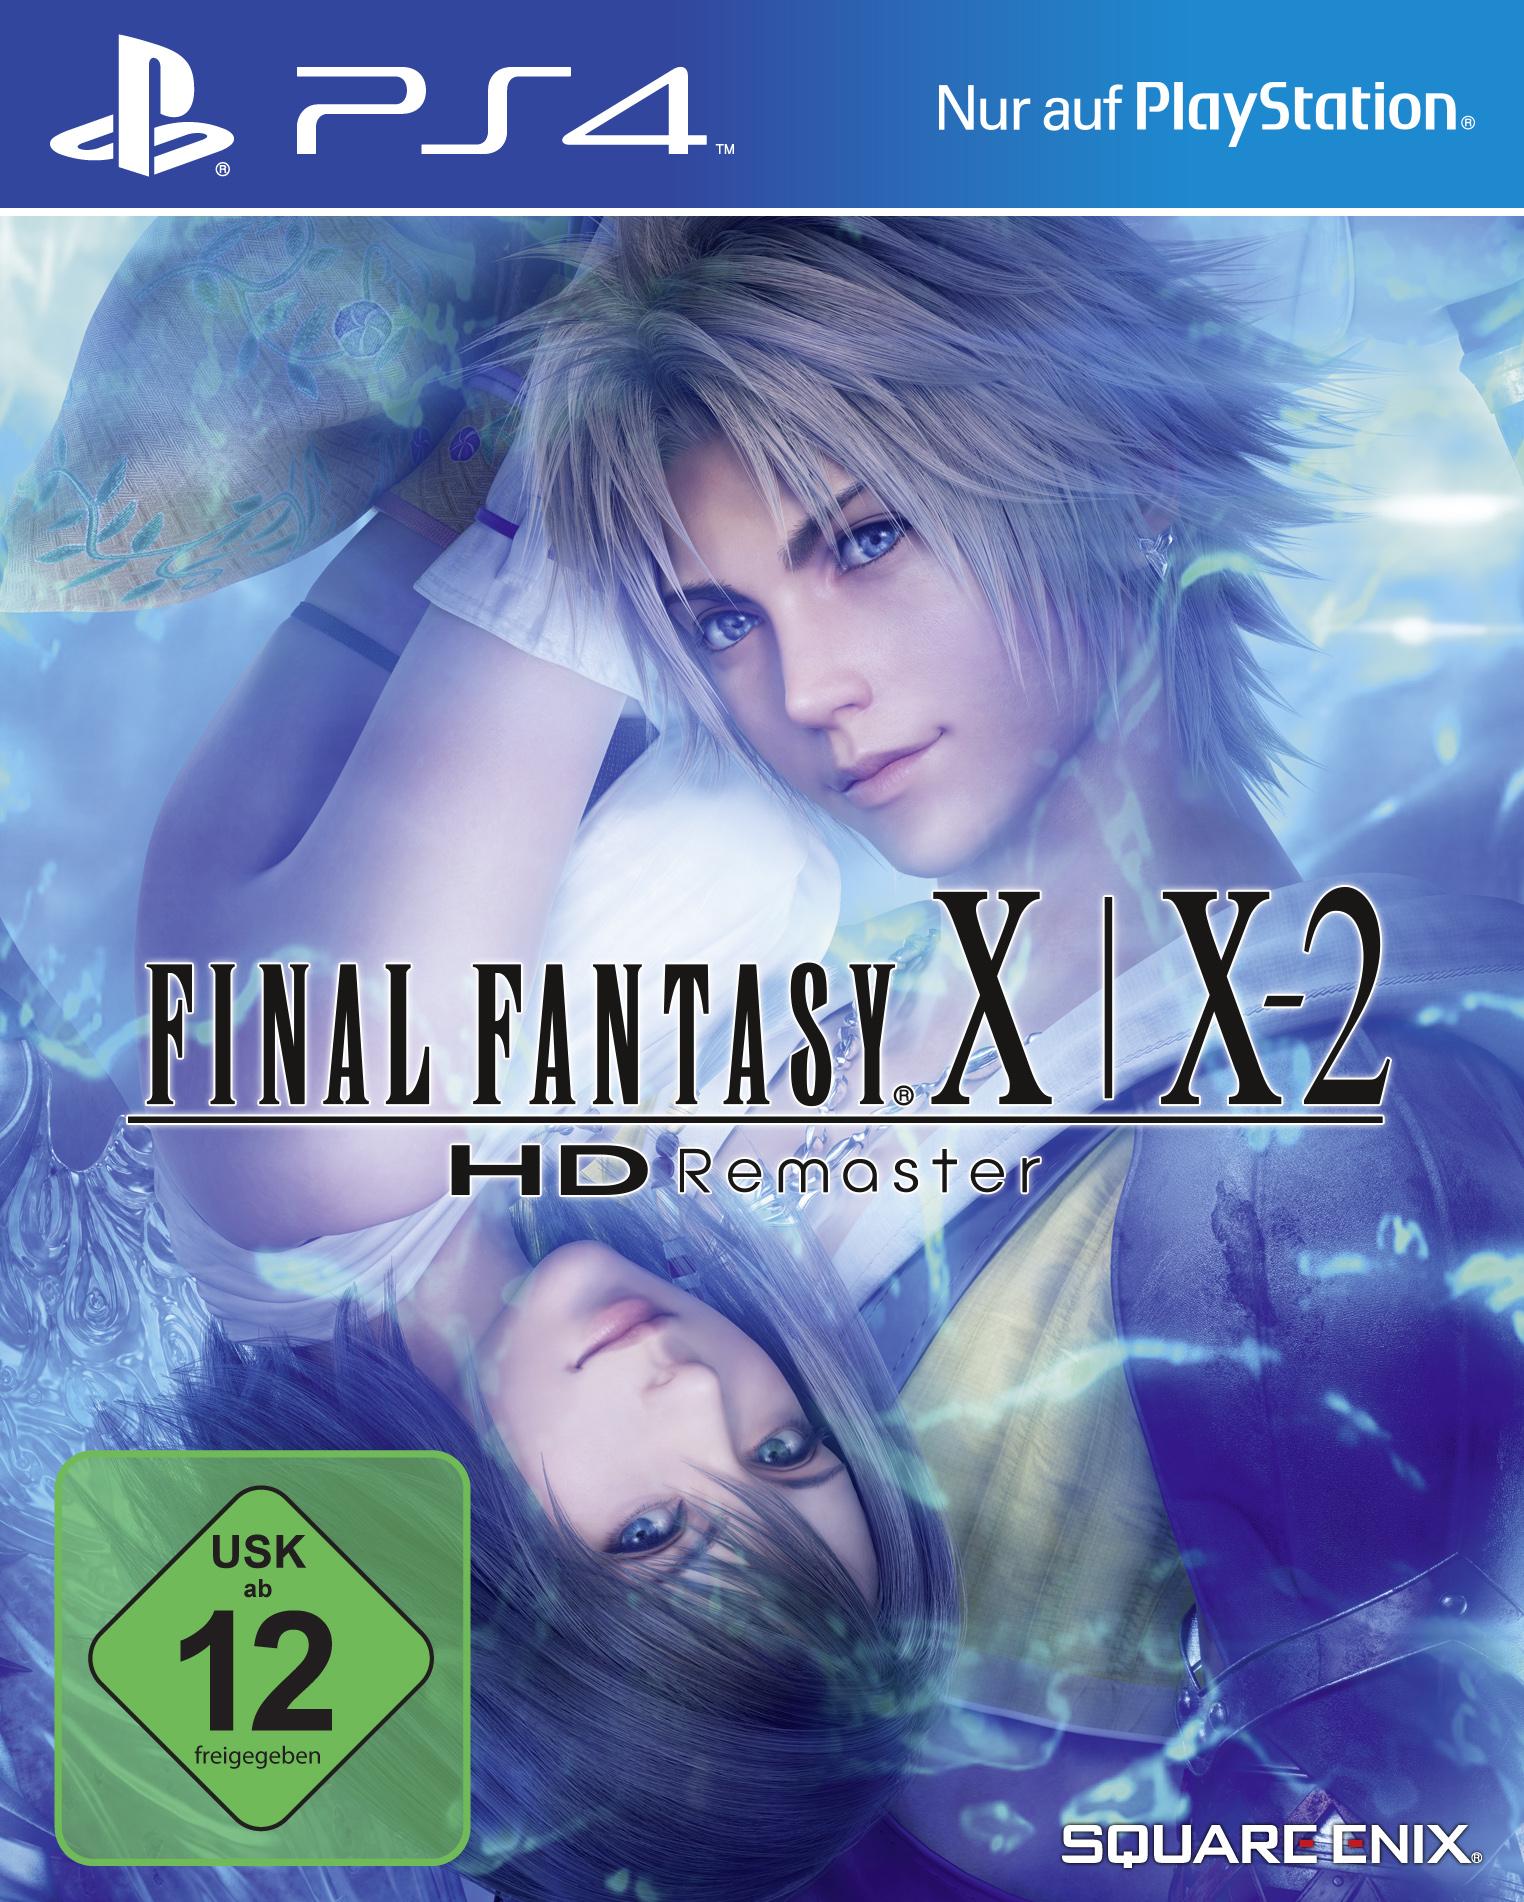 Final Fantasy X - X-2 HD Remaster